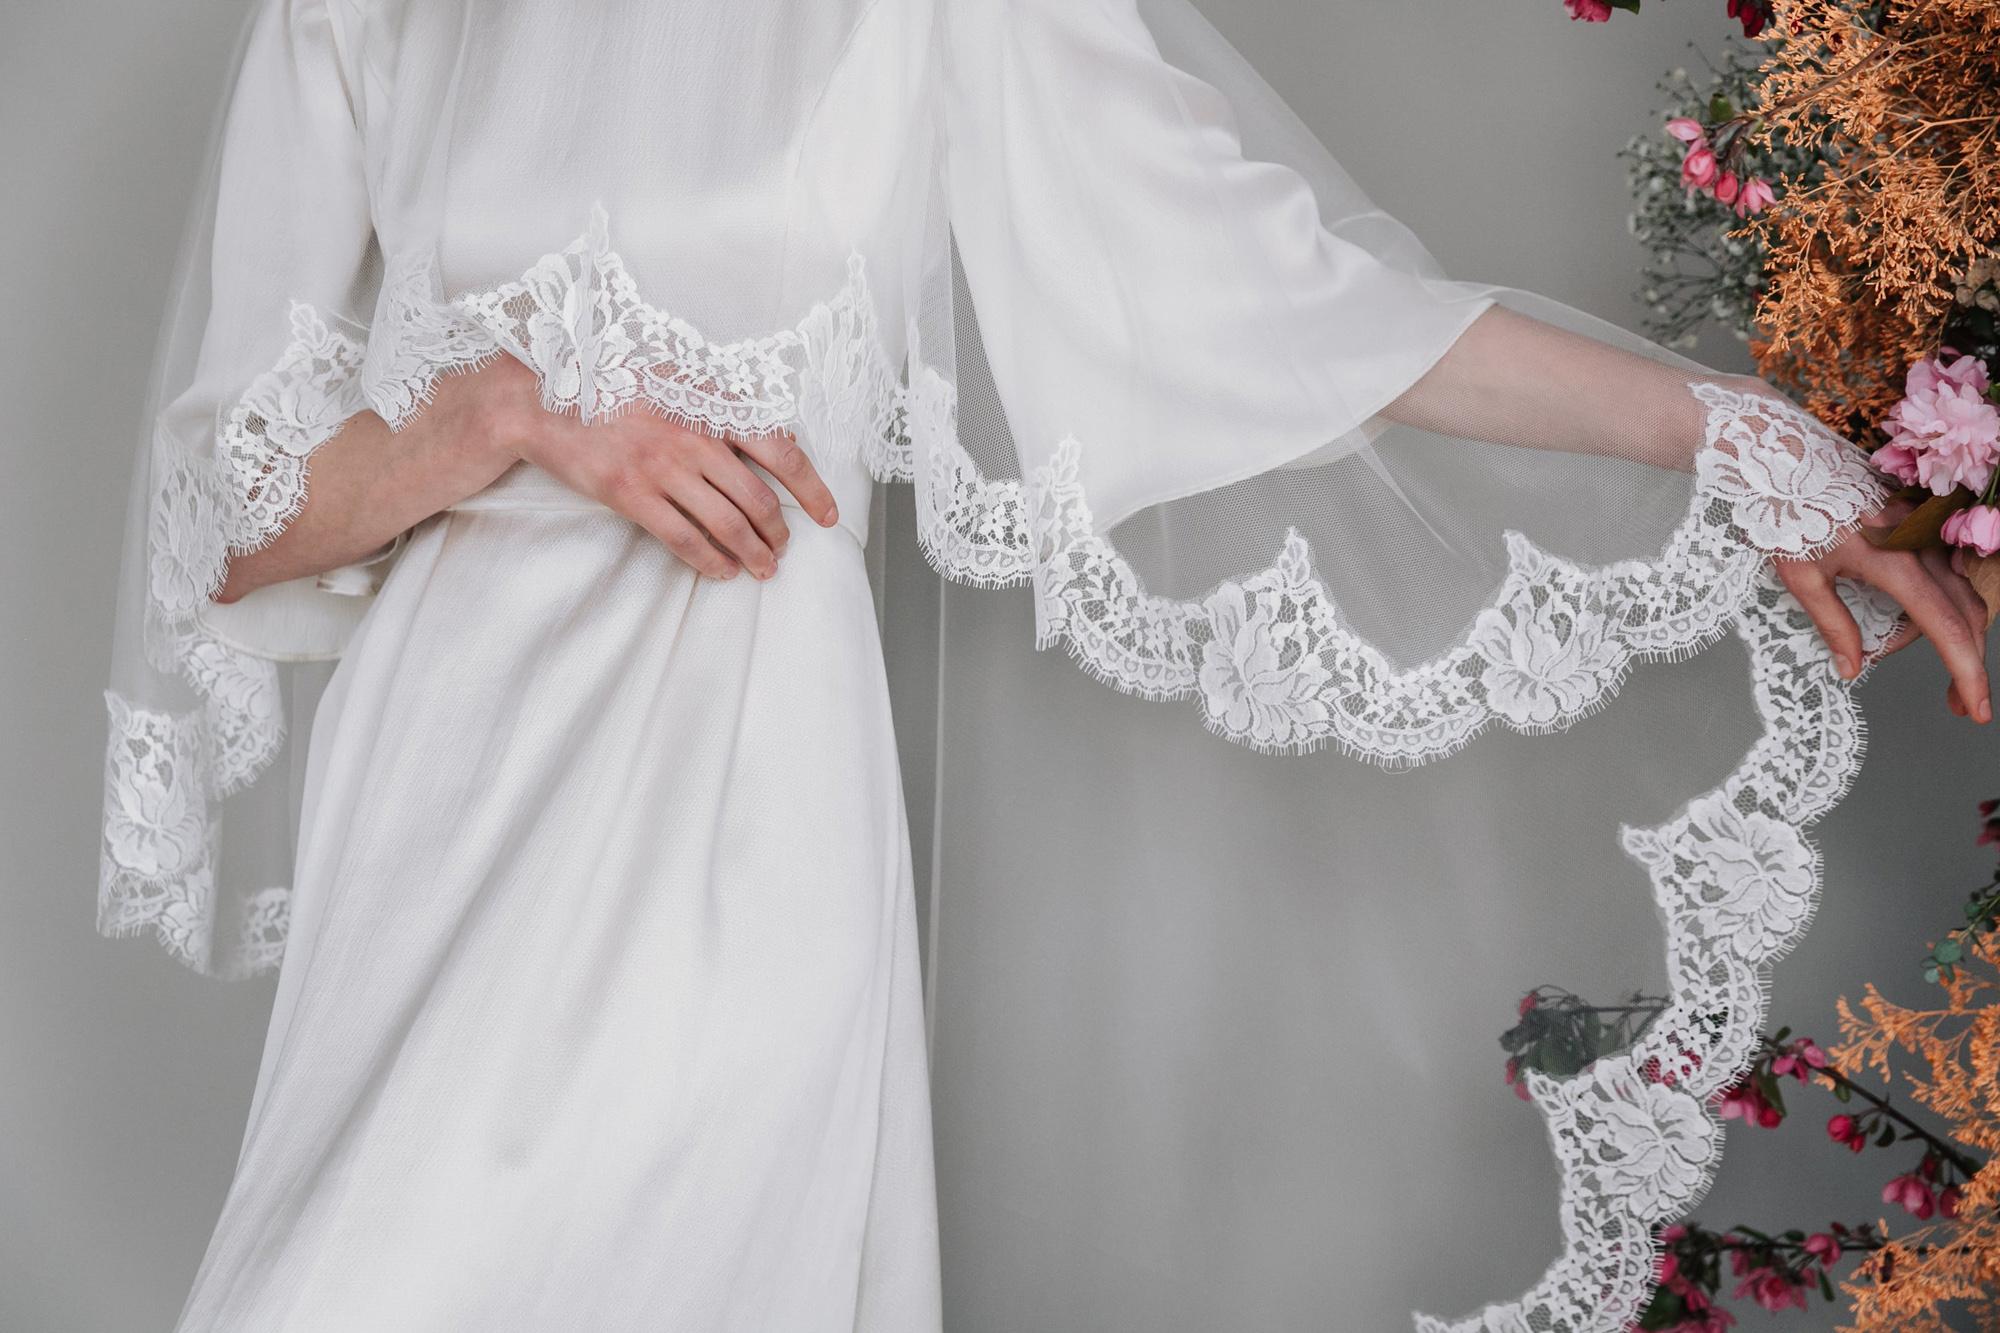 Kate-Beaumont-Lunaria-Bohemian-Hammered-Silk-Wedding-Dress-Sleeves-18.jpg